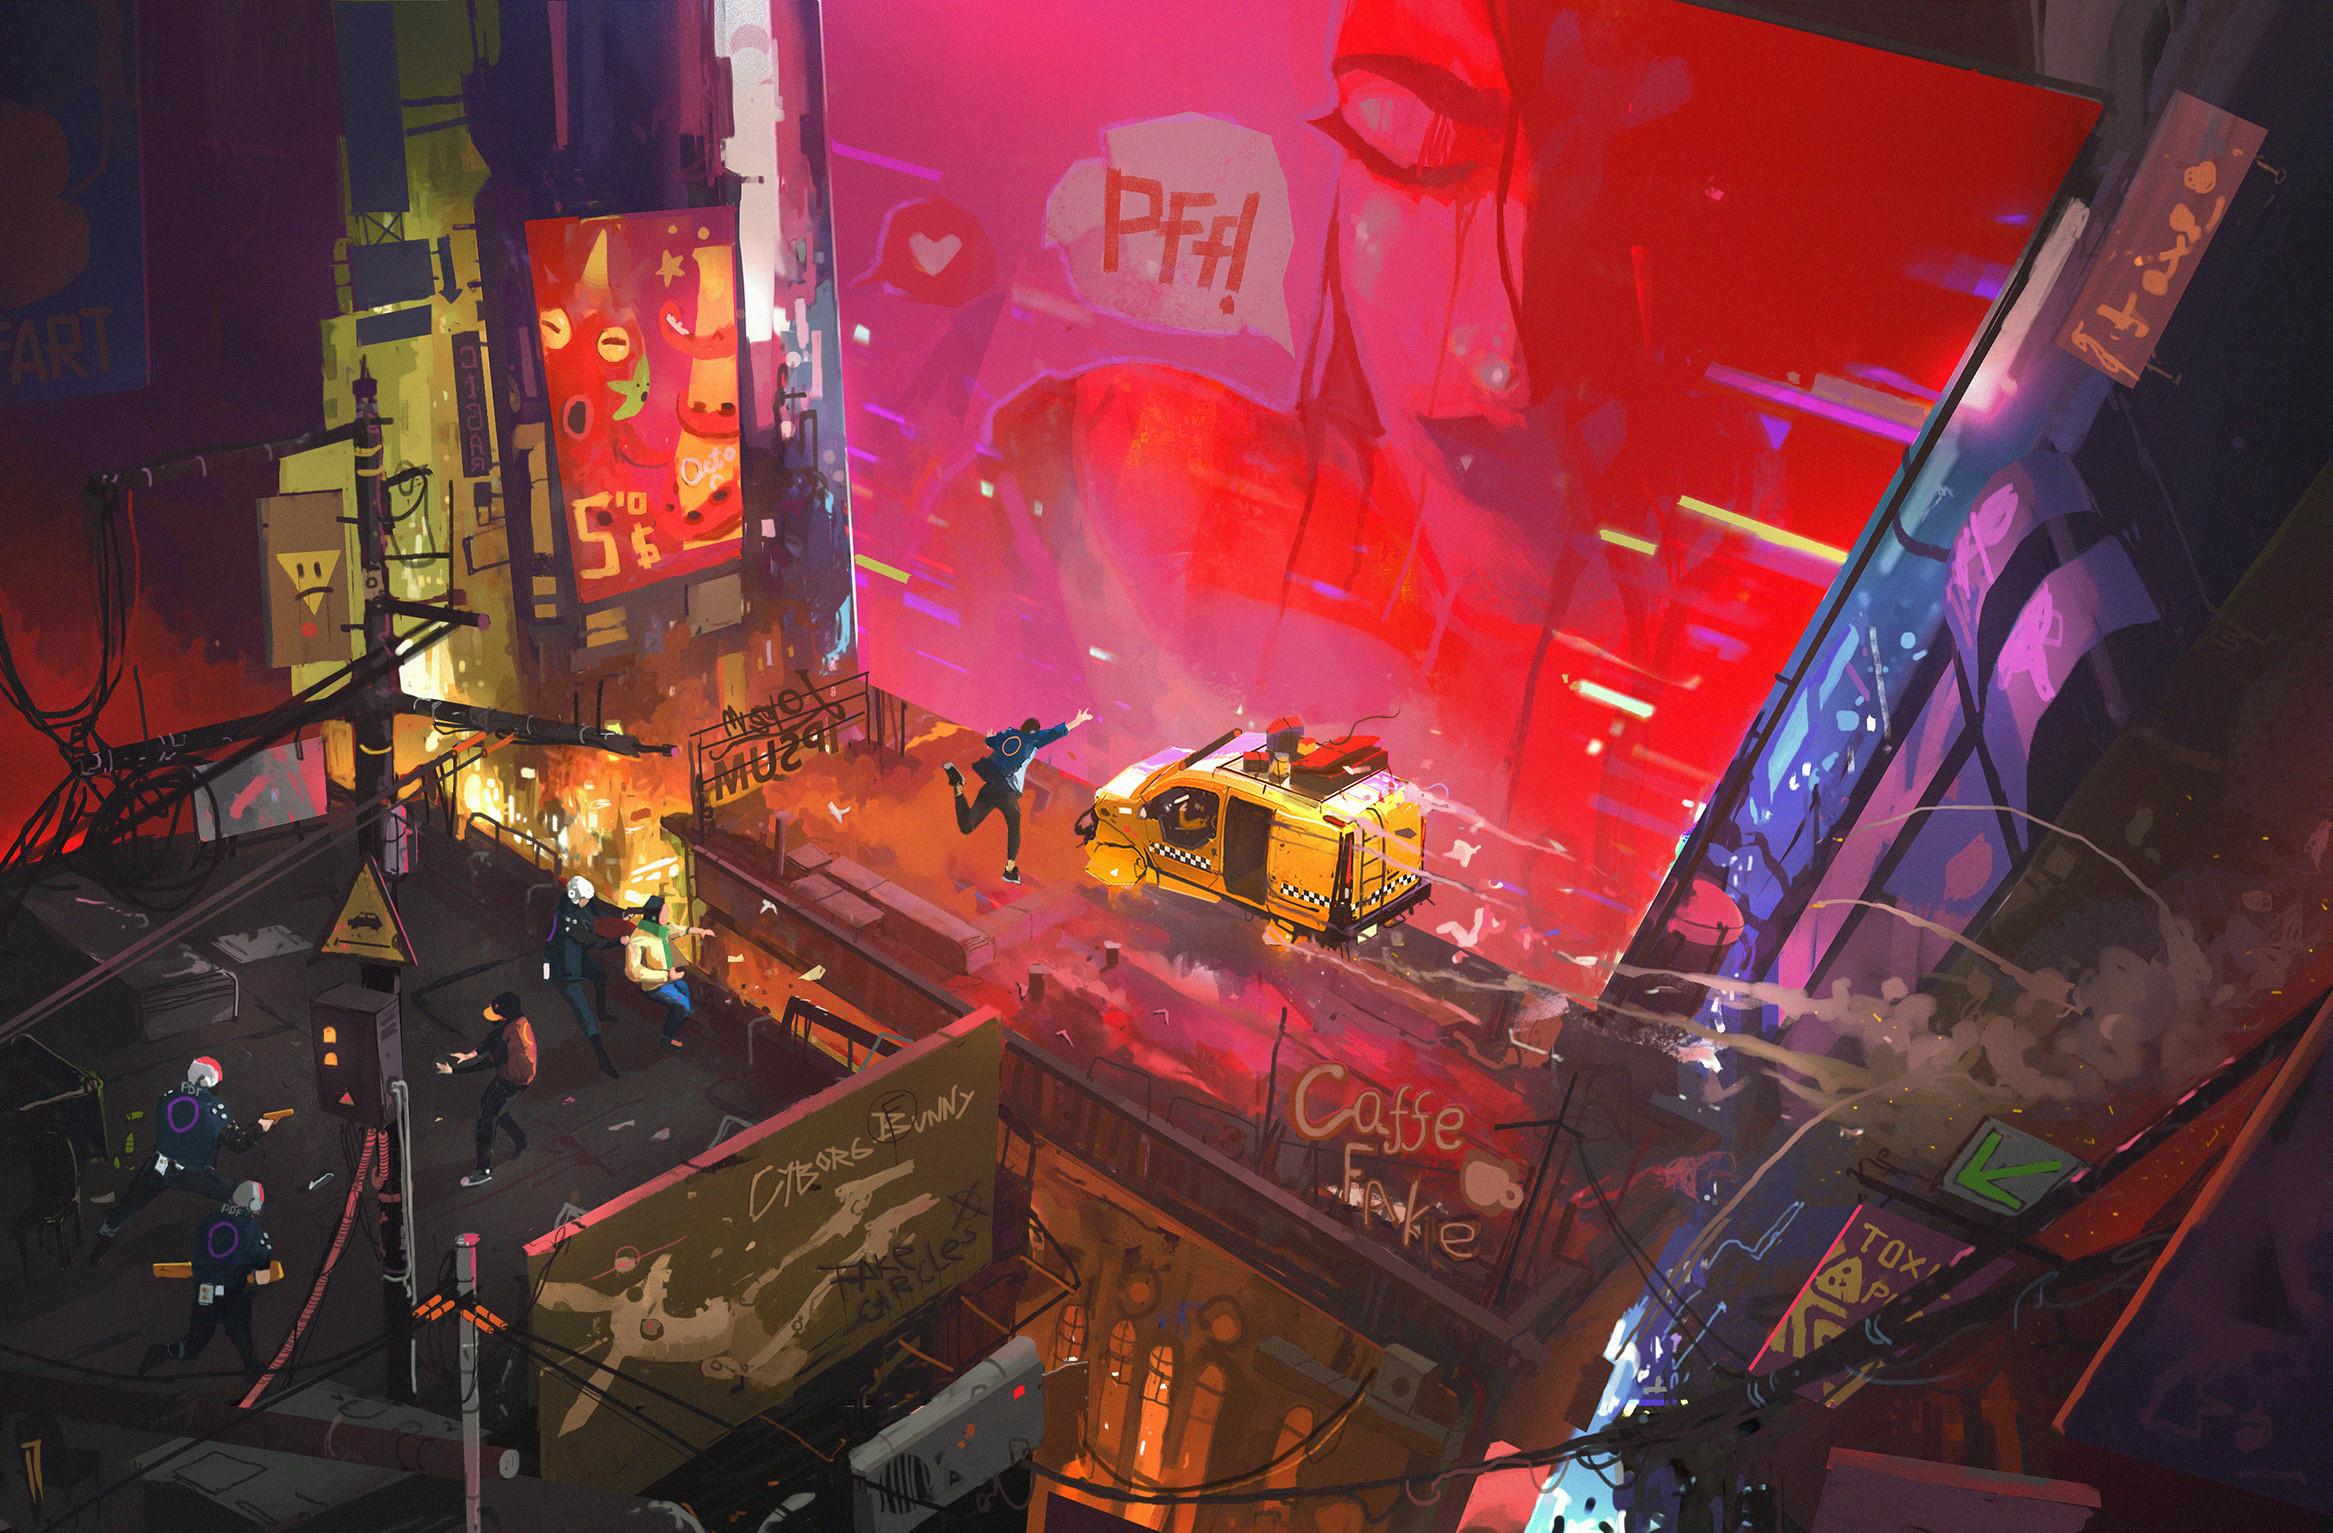 General 2333x1533 artwork digital art Ismail Inceoglu futuristic cyber city